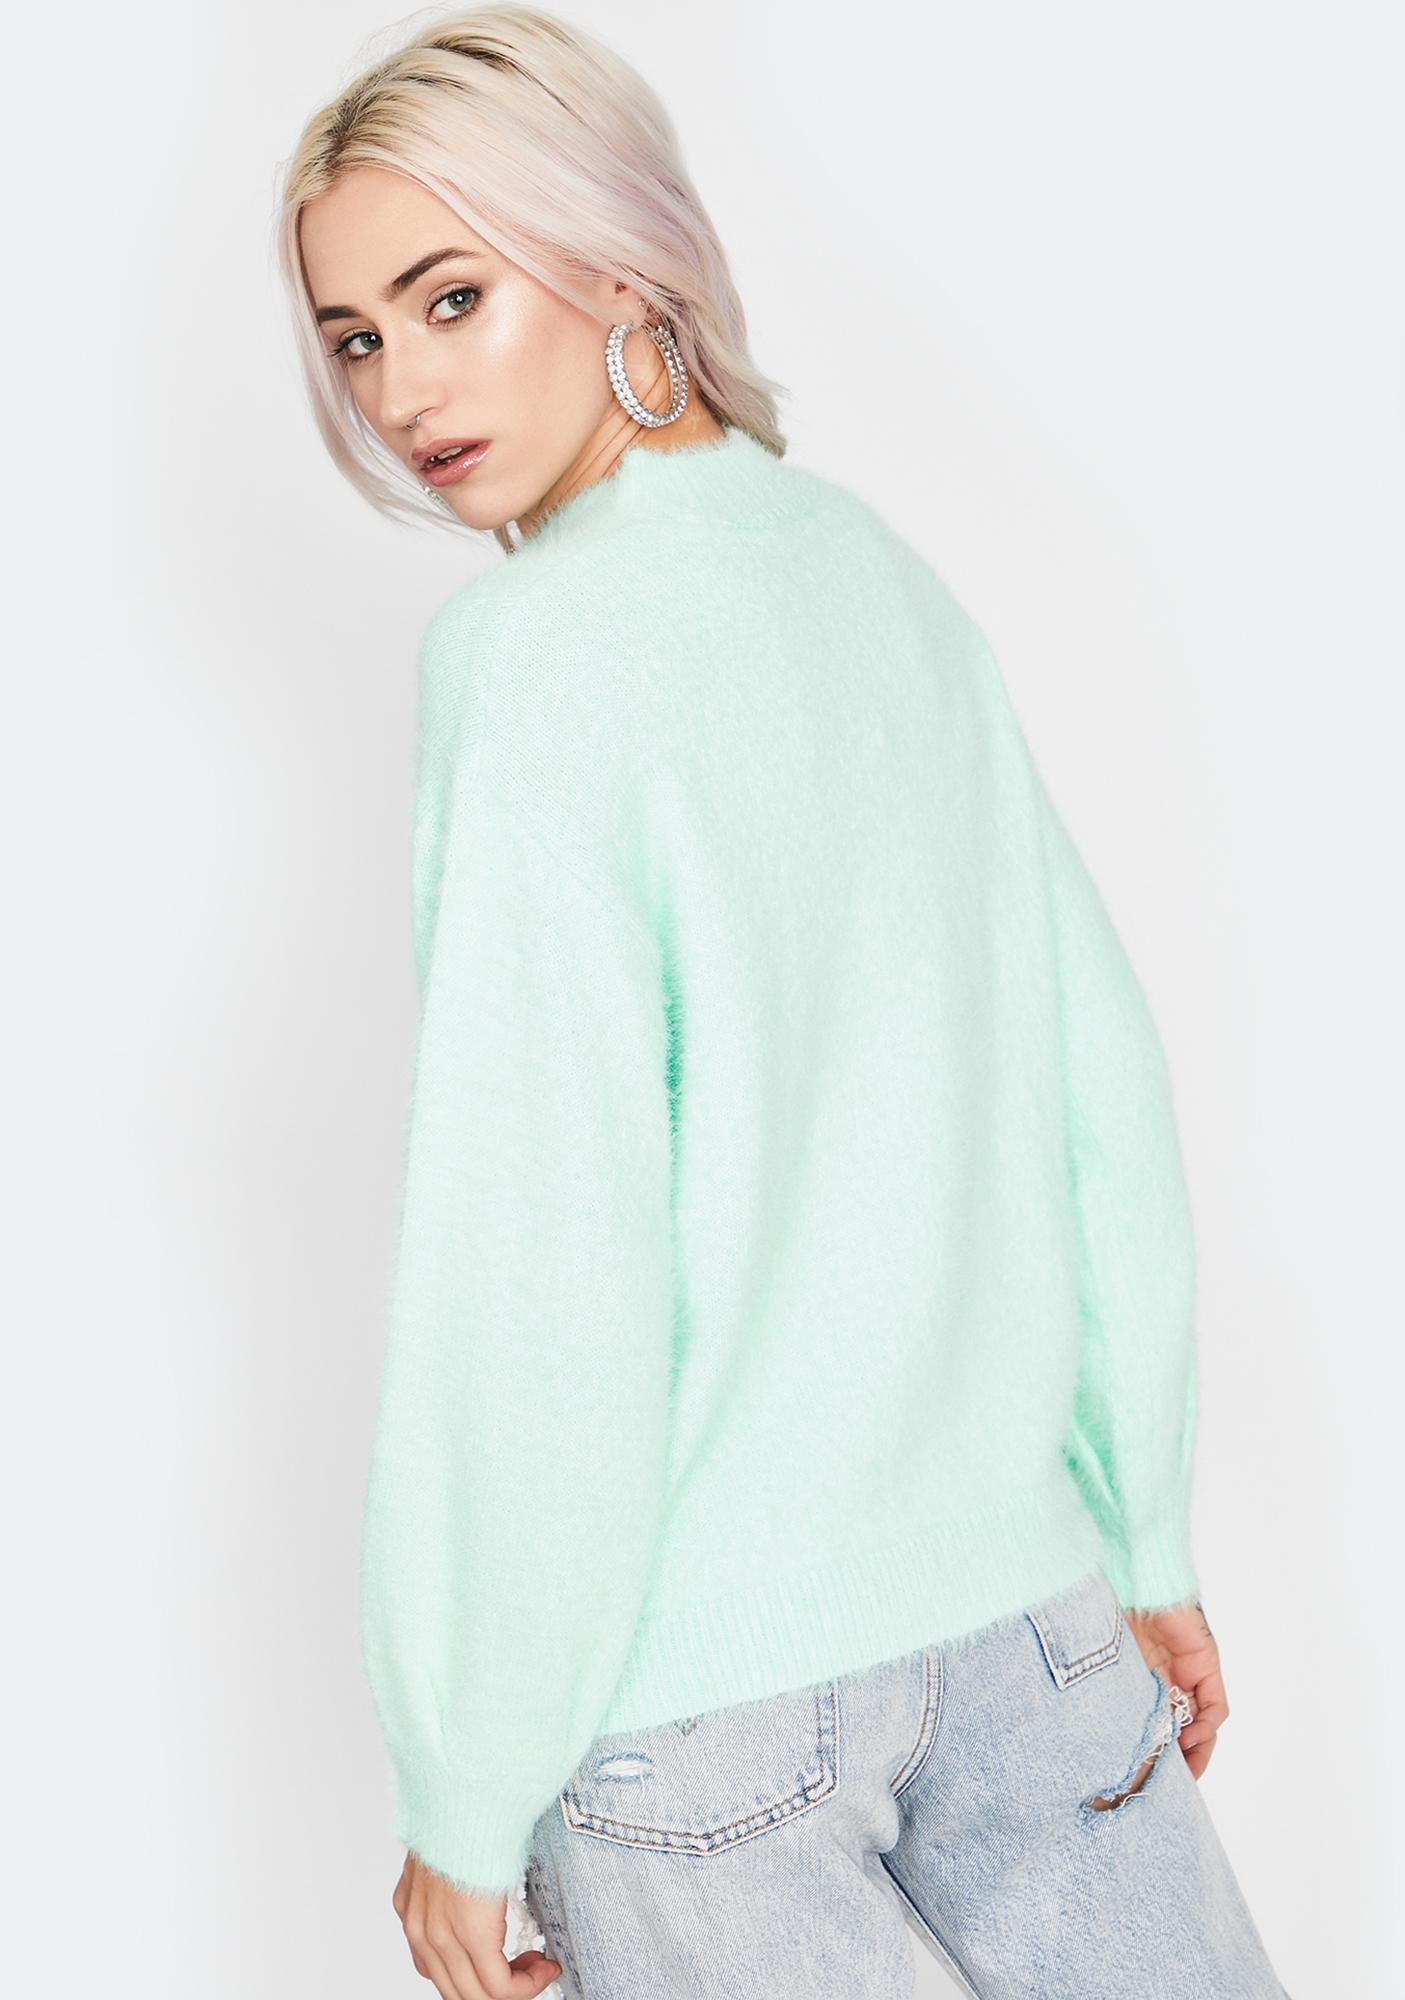 Mint Keep It Simple Knit Sweater